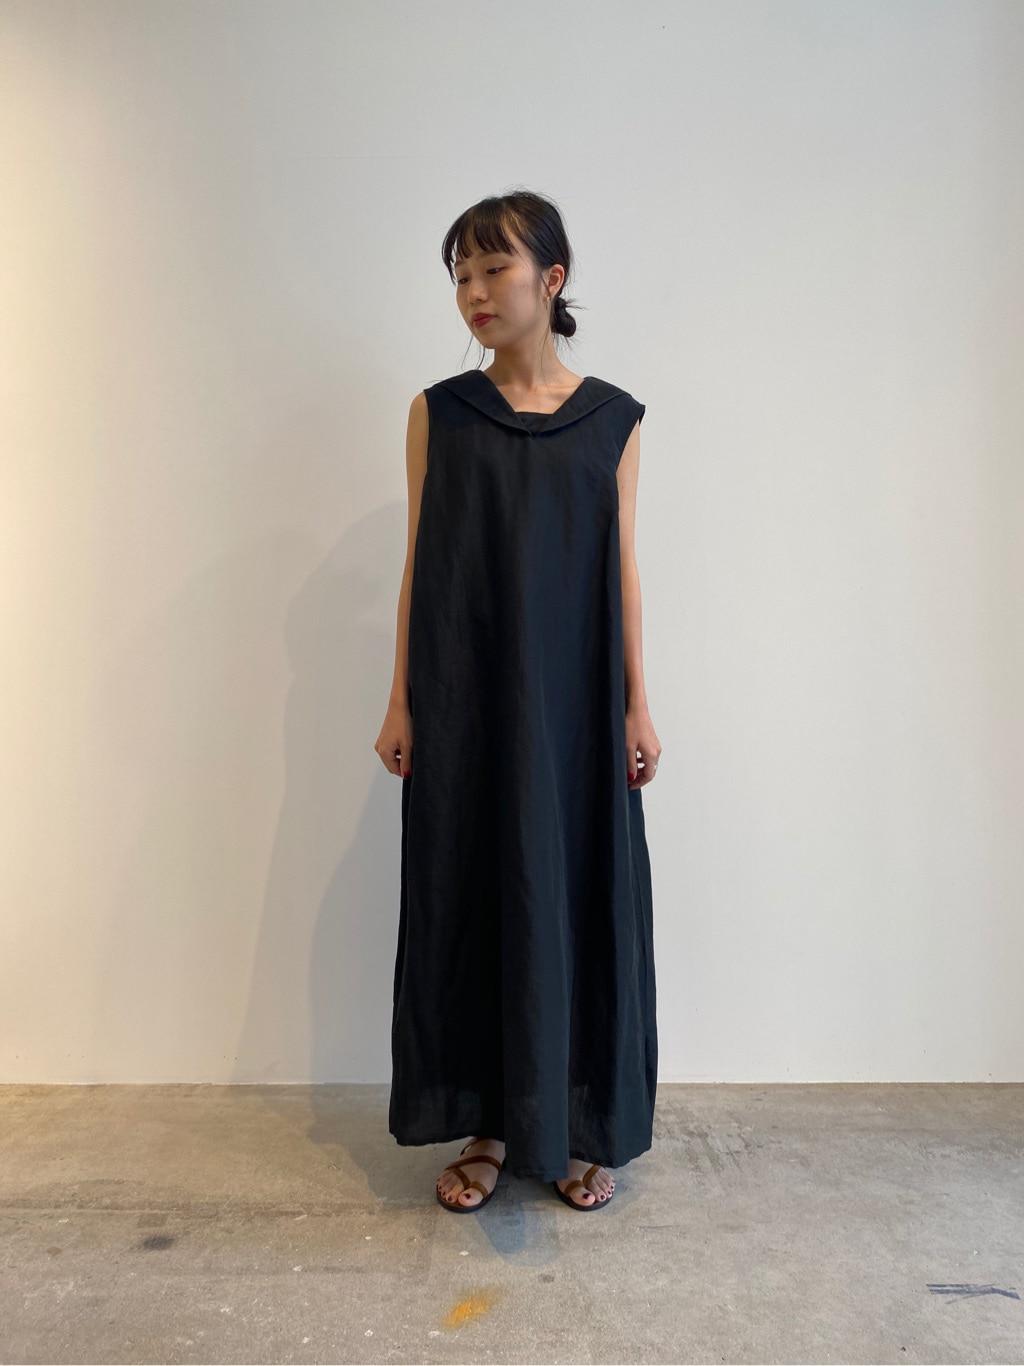 - bulle de savon FLAT AMB 名古屋栄路面 身長:152cm 2020.08.19